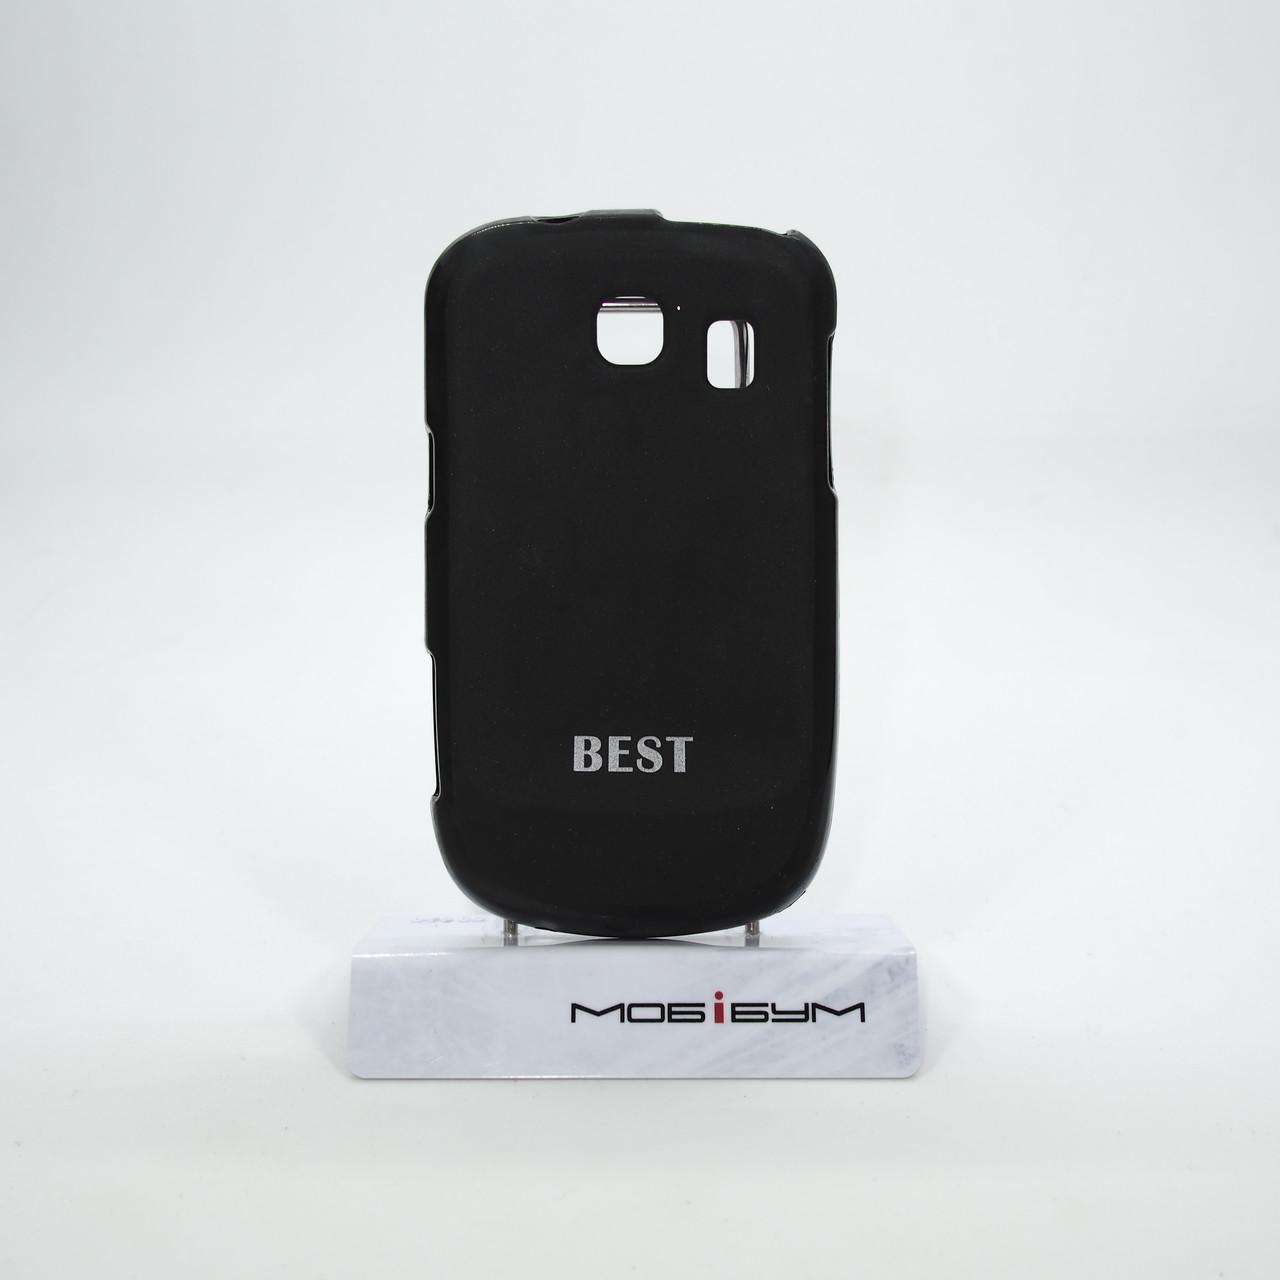 Чехол Silicon Best Samsung S3850 black